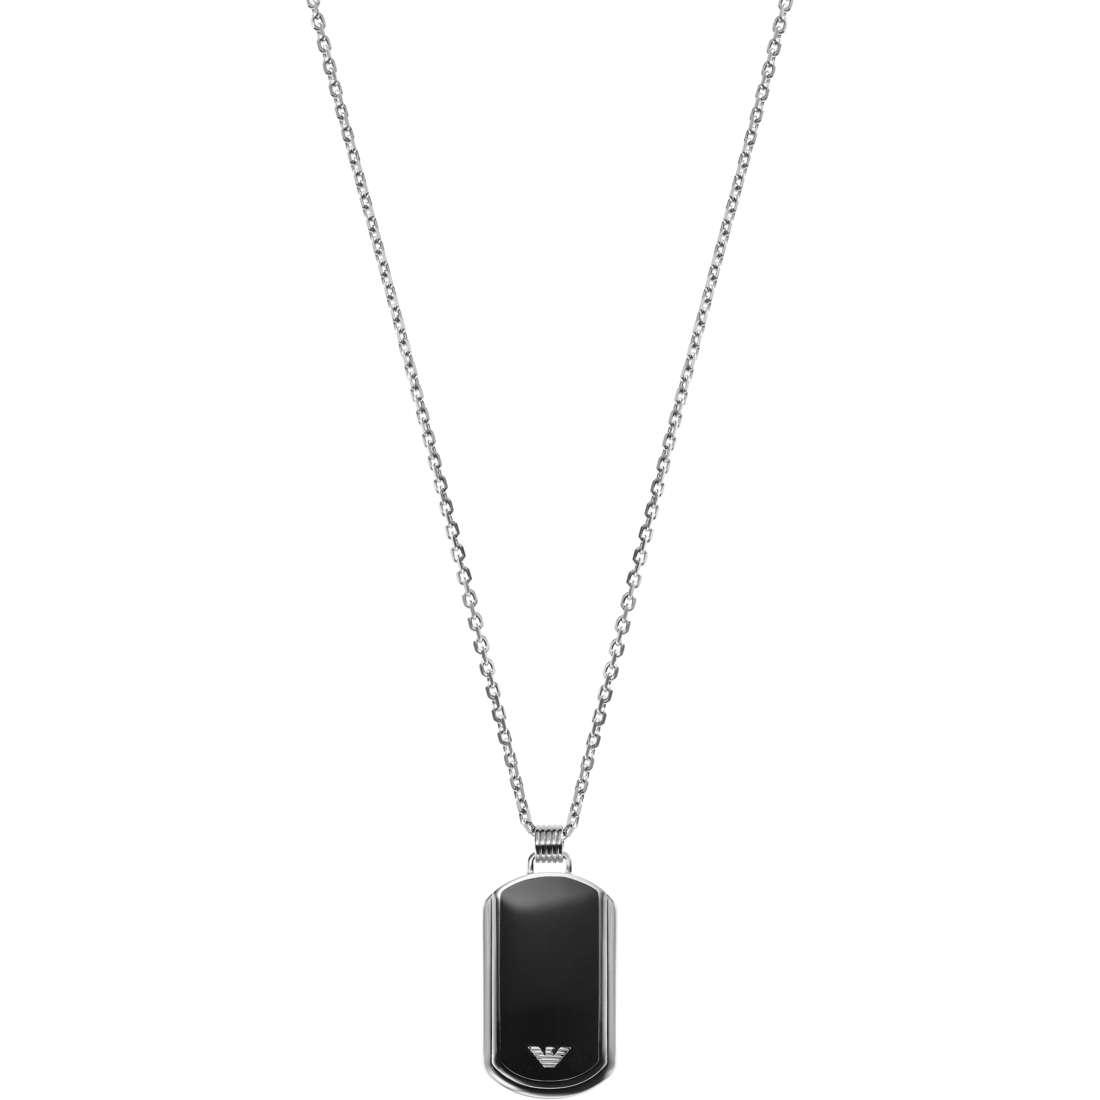 necklace man jewellery Emporio Armani EGS1726040